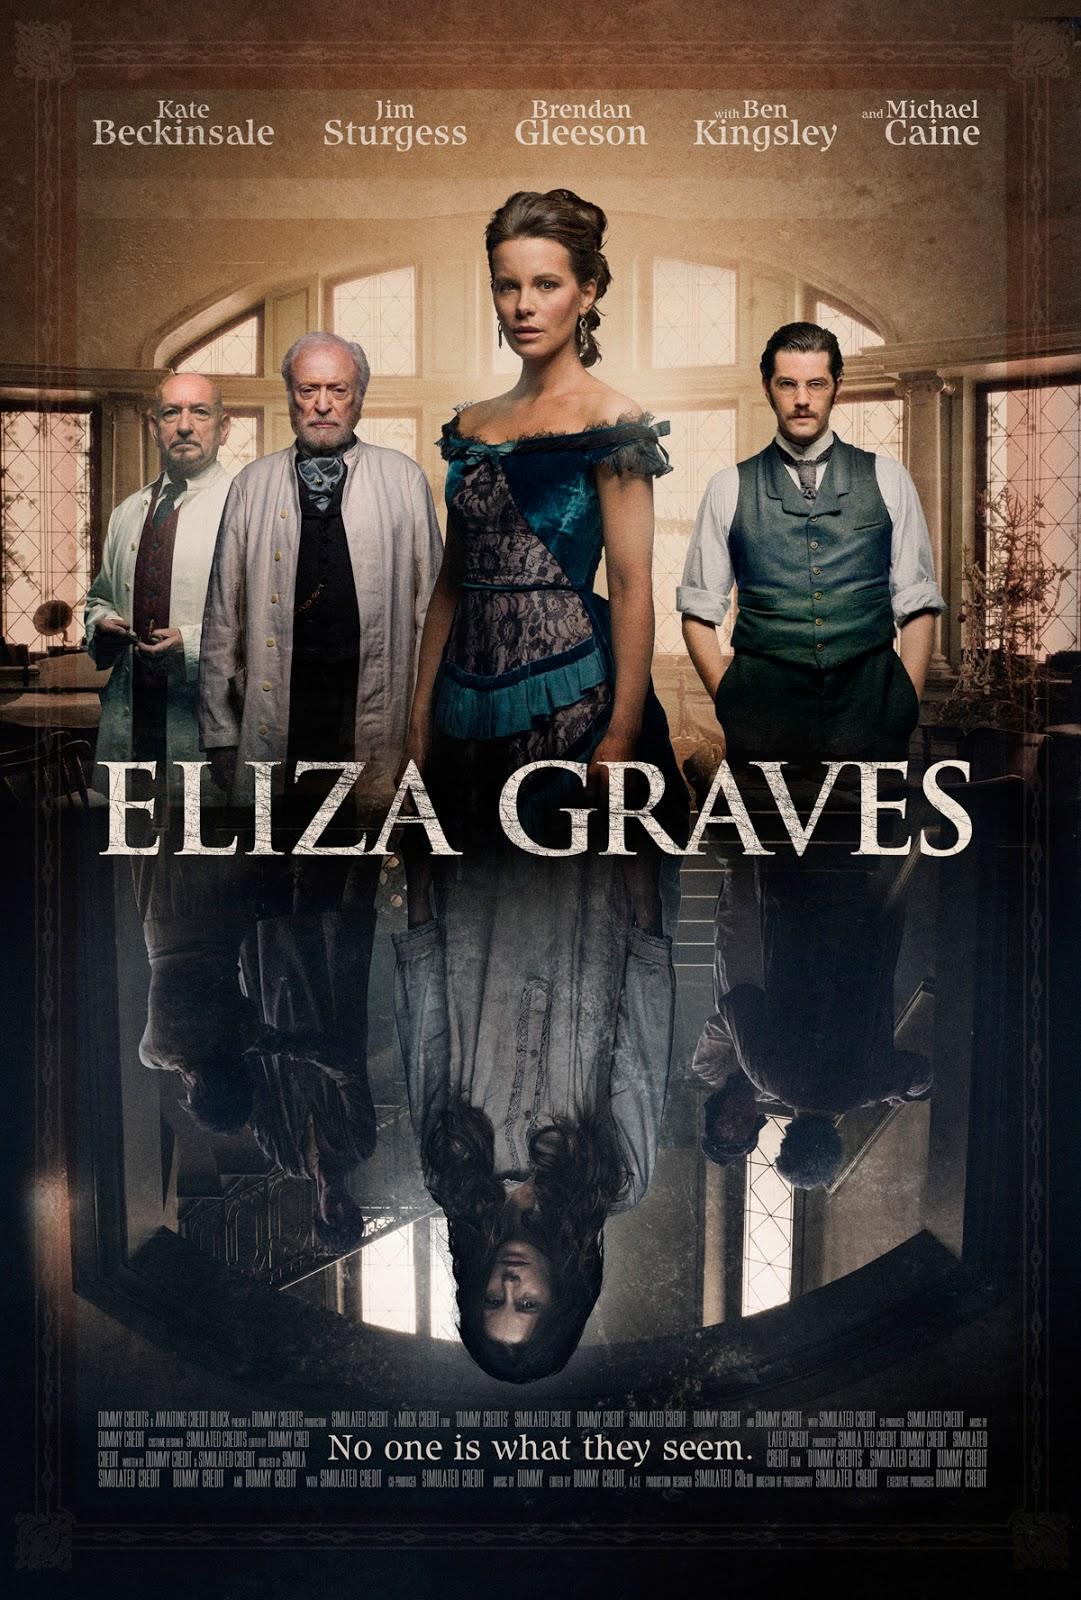 eliza graves - photo #1